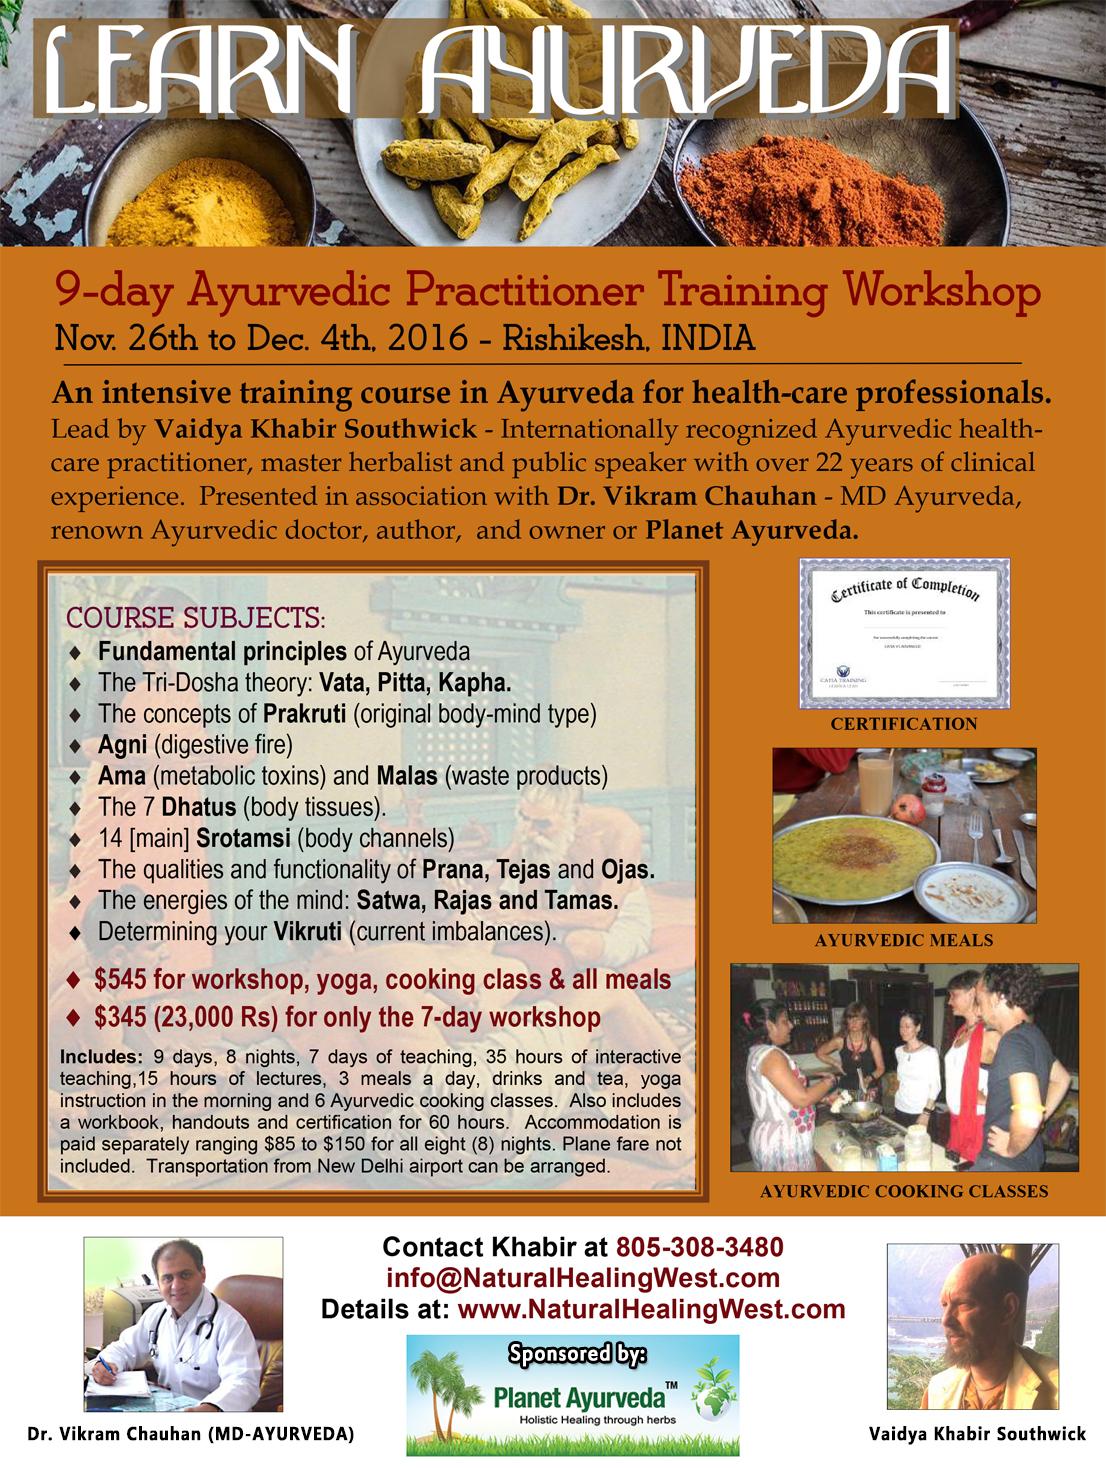 9-Day Ayurvedic Practitioner Workshop - Rishikesh, India